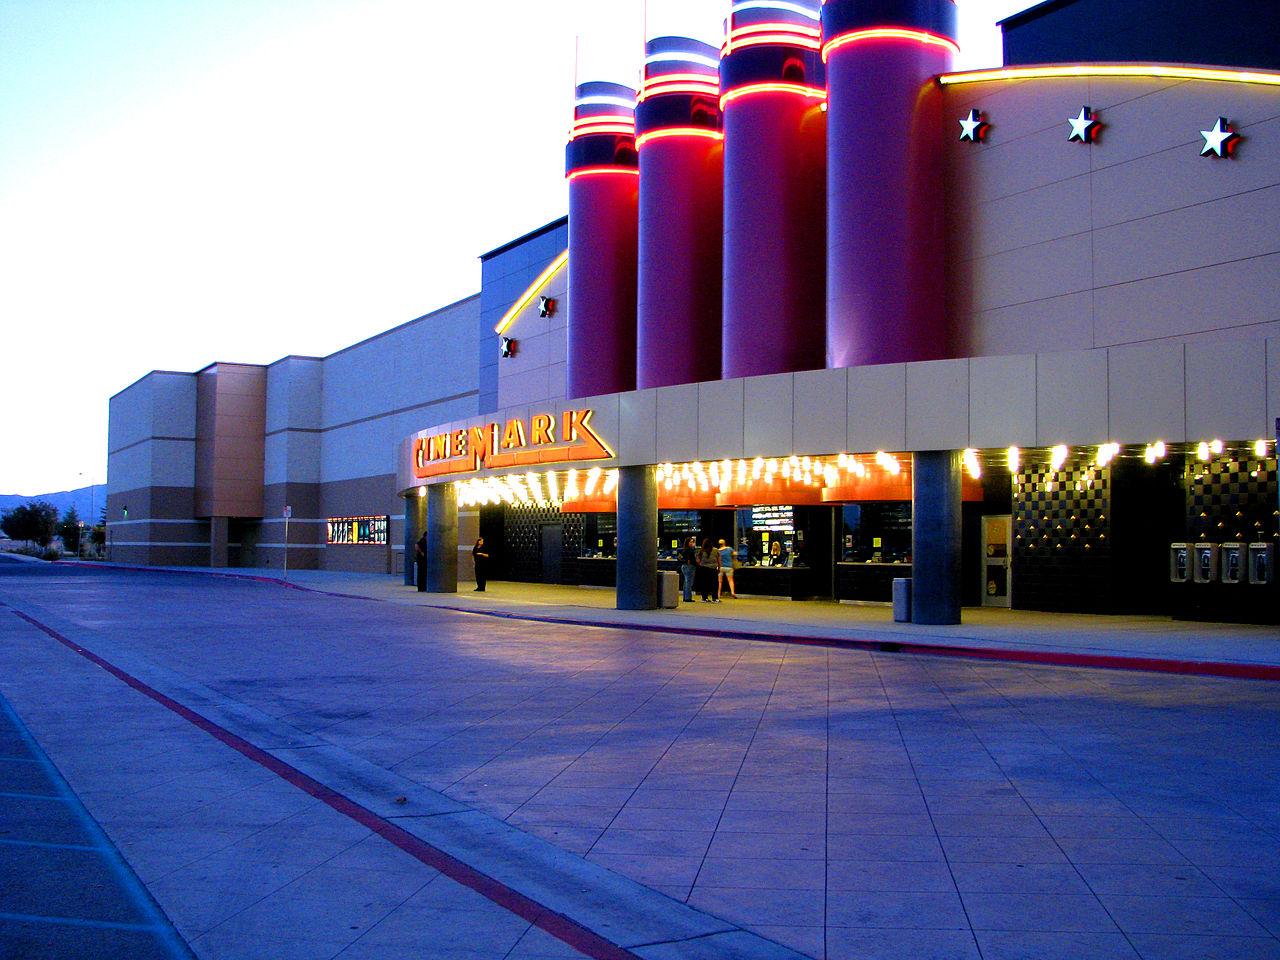 File:Cinemark Theater (2967688795).jpg - Wikimedia Commons